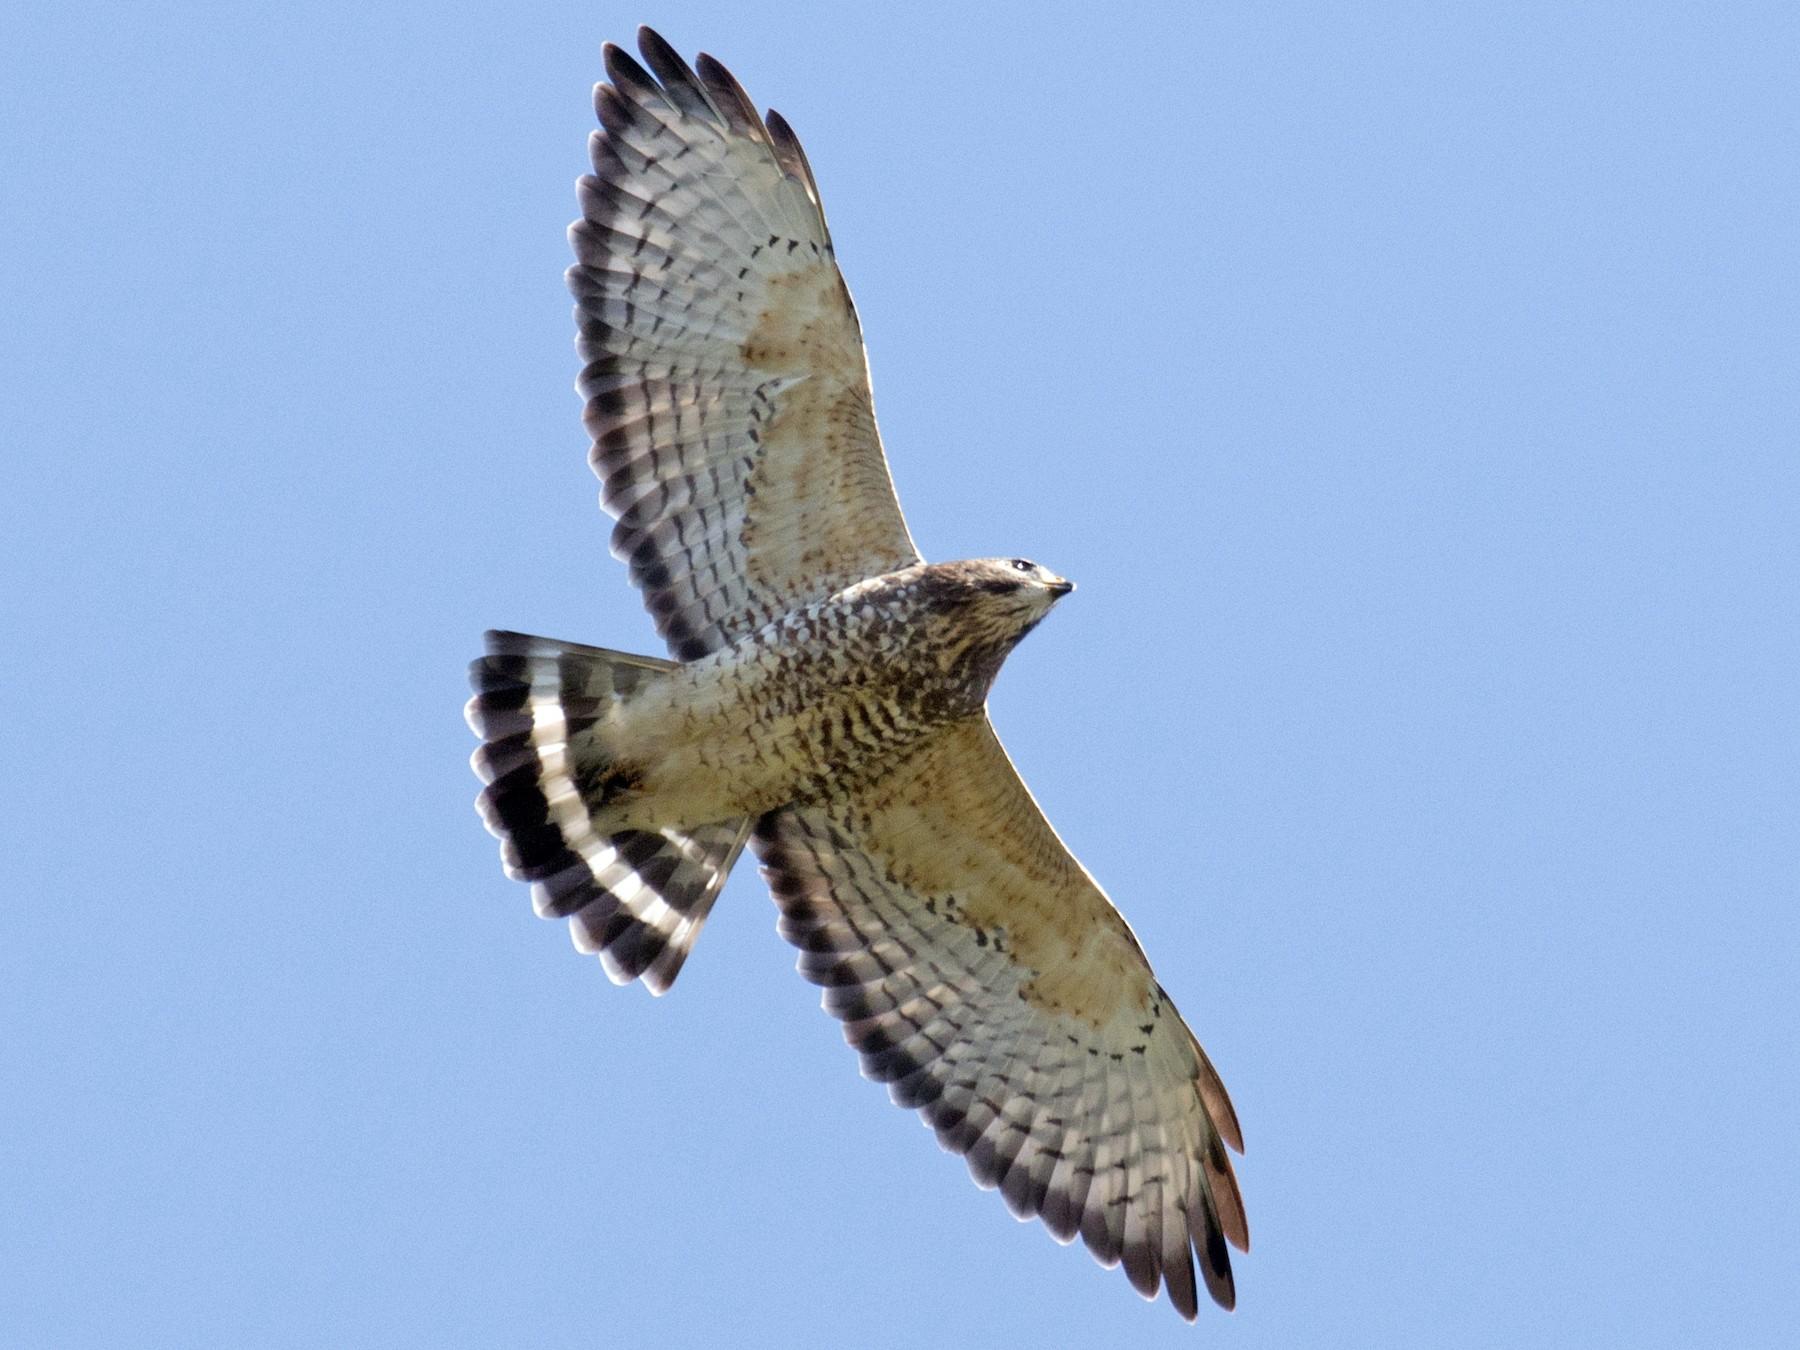 Broad-winged Hawk - David Brown